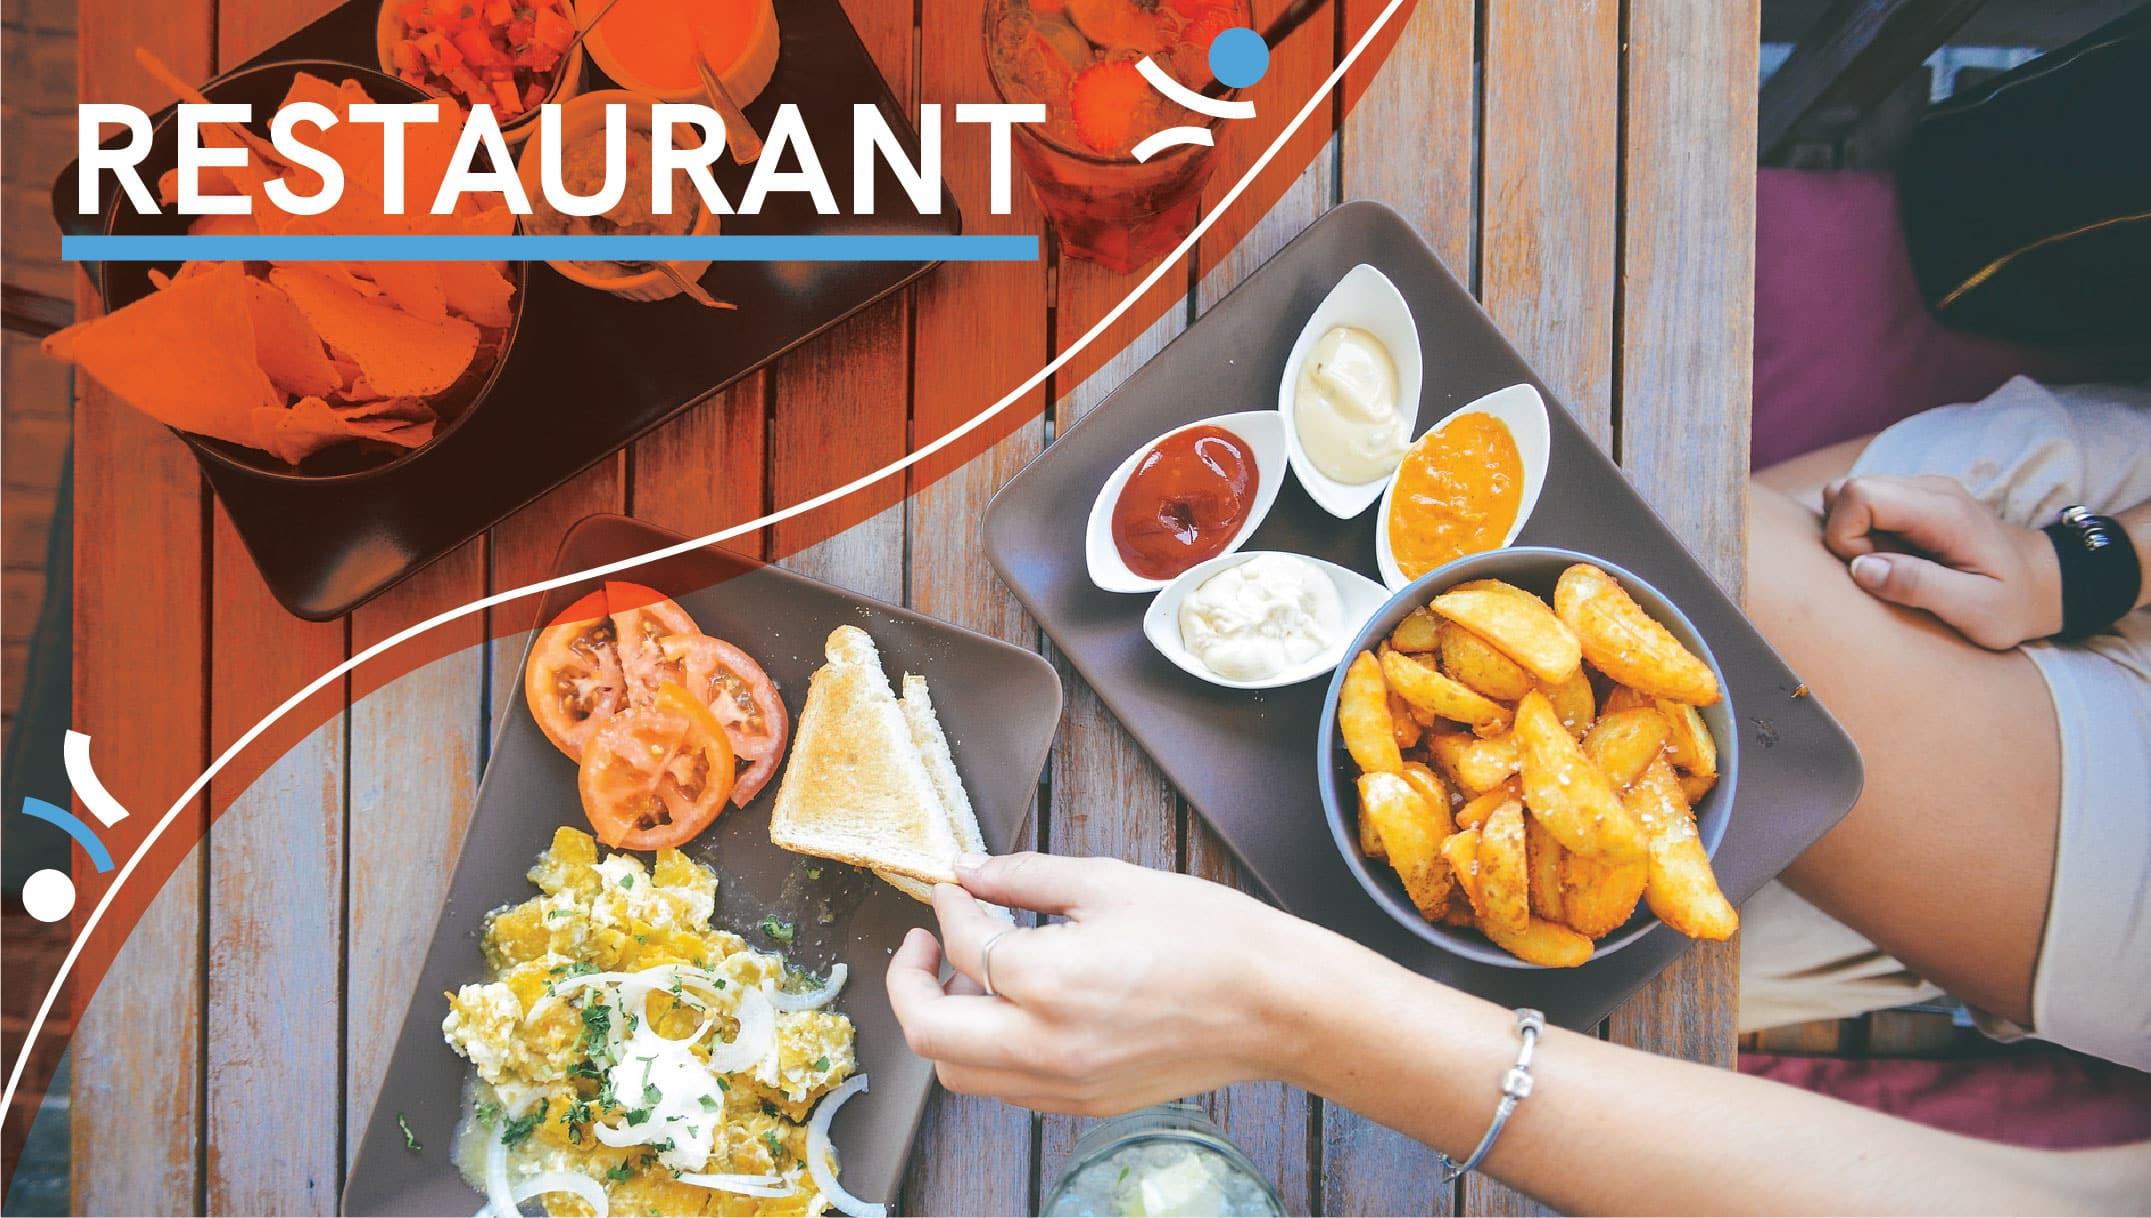 Ethic Adveritsing Agency industry vertical image for restaurants advertising